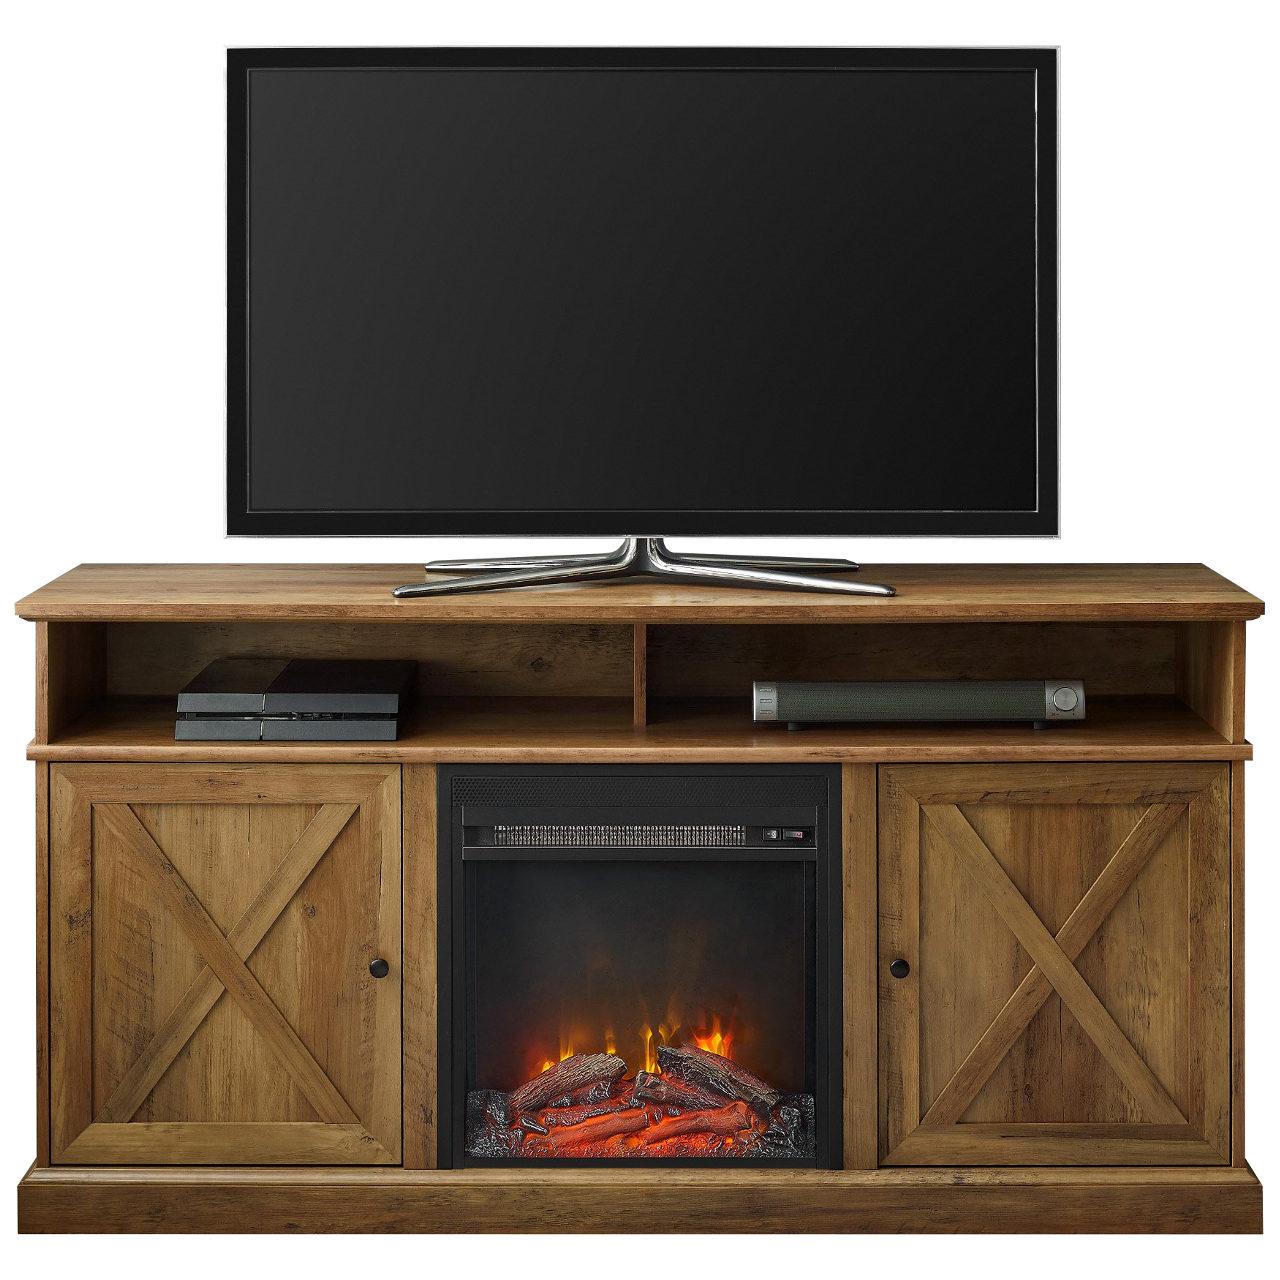 "Walker Edison Cherrington 60"" Tall Fireplace TV Stand - Barnwood"